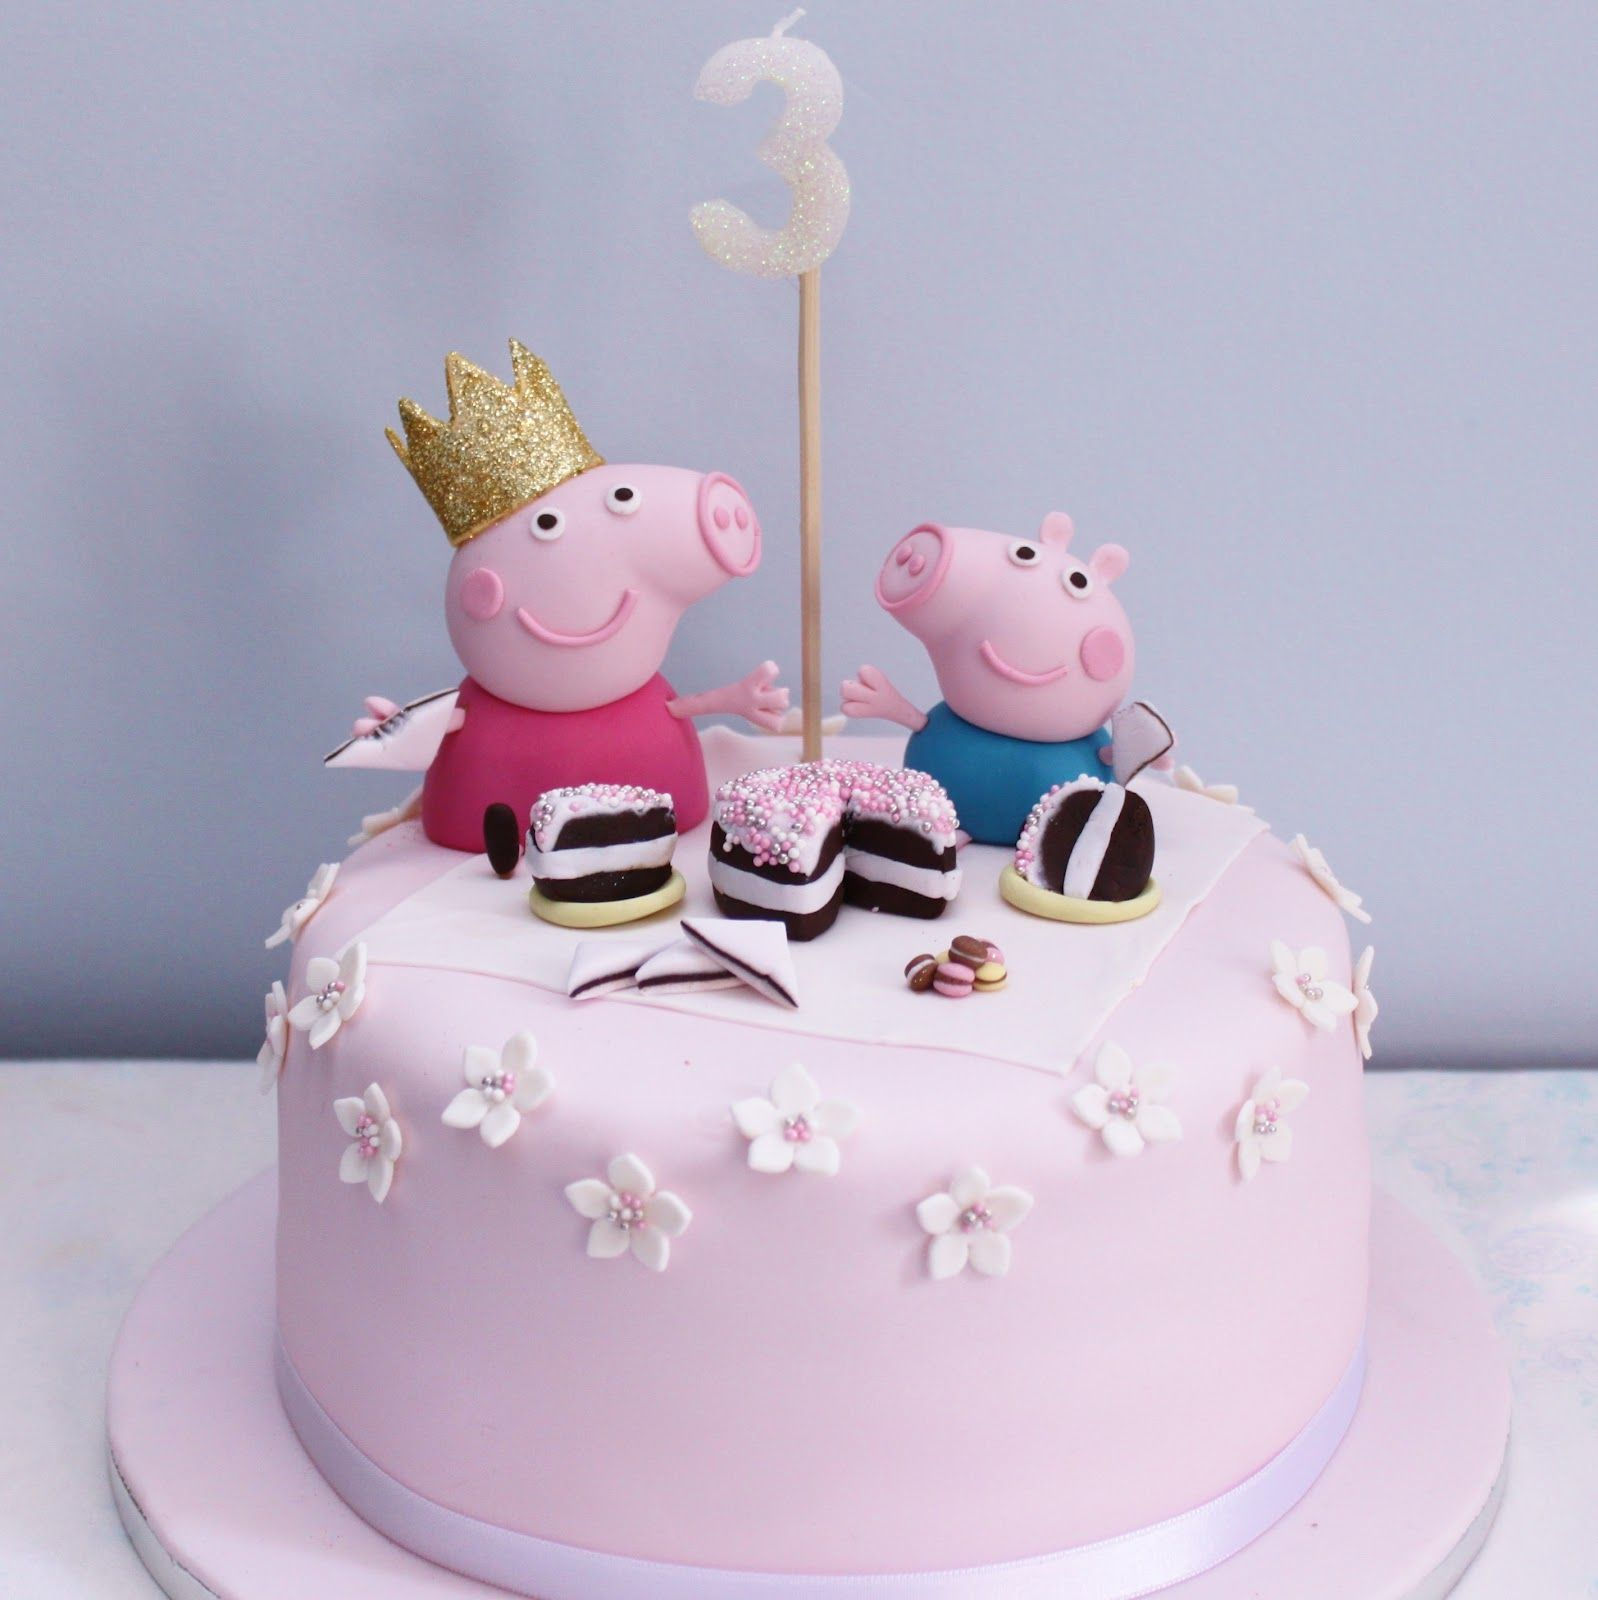 Atelier sucr me pastel cumplea os de peppa pig para - Bizcocho cumpleanos para ninos ...